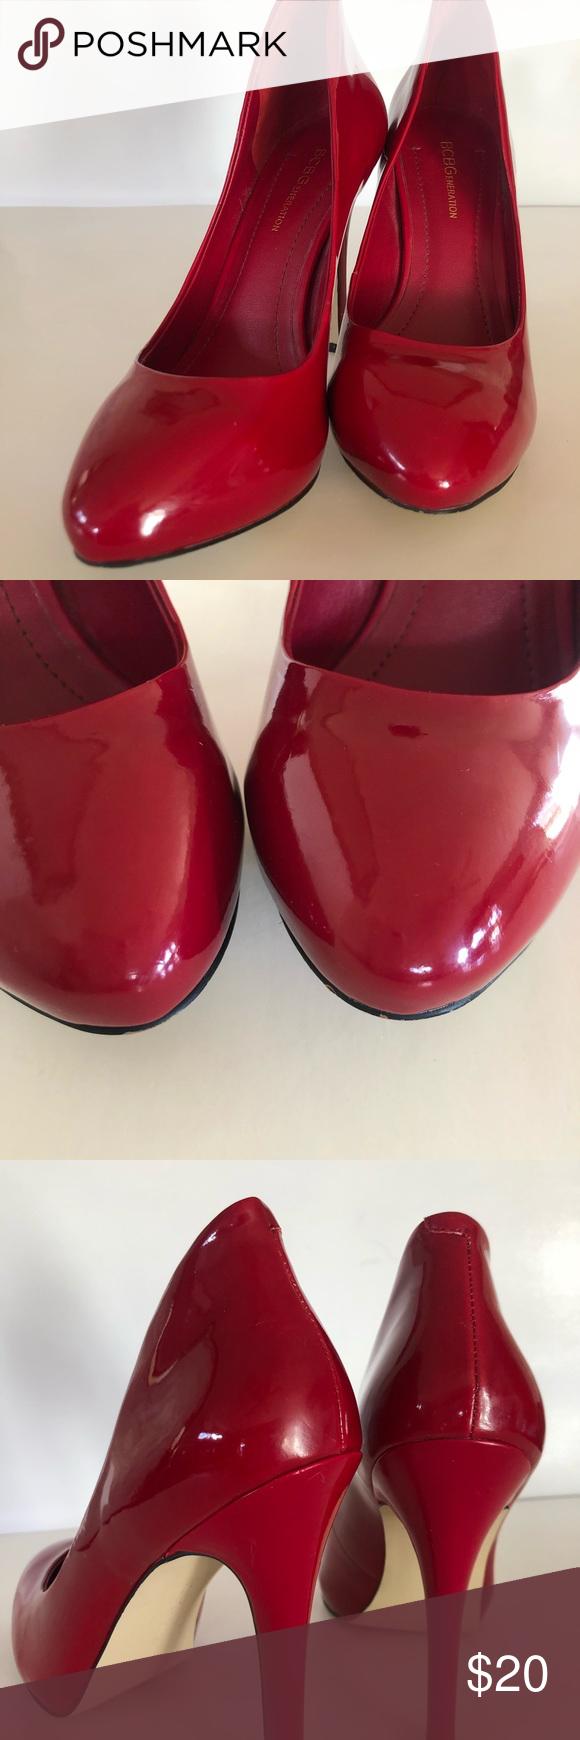 "BCBGeneration Platform Heels BCBGeneration platform heels 4.5"" heel Candy Appl…"